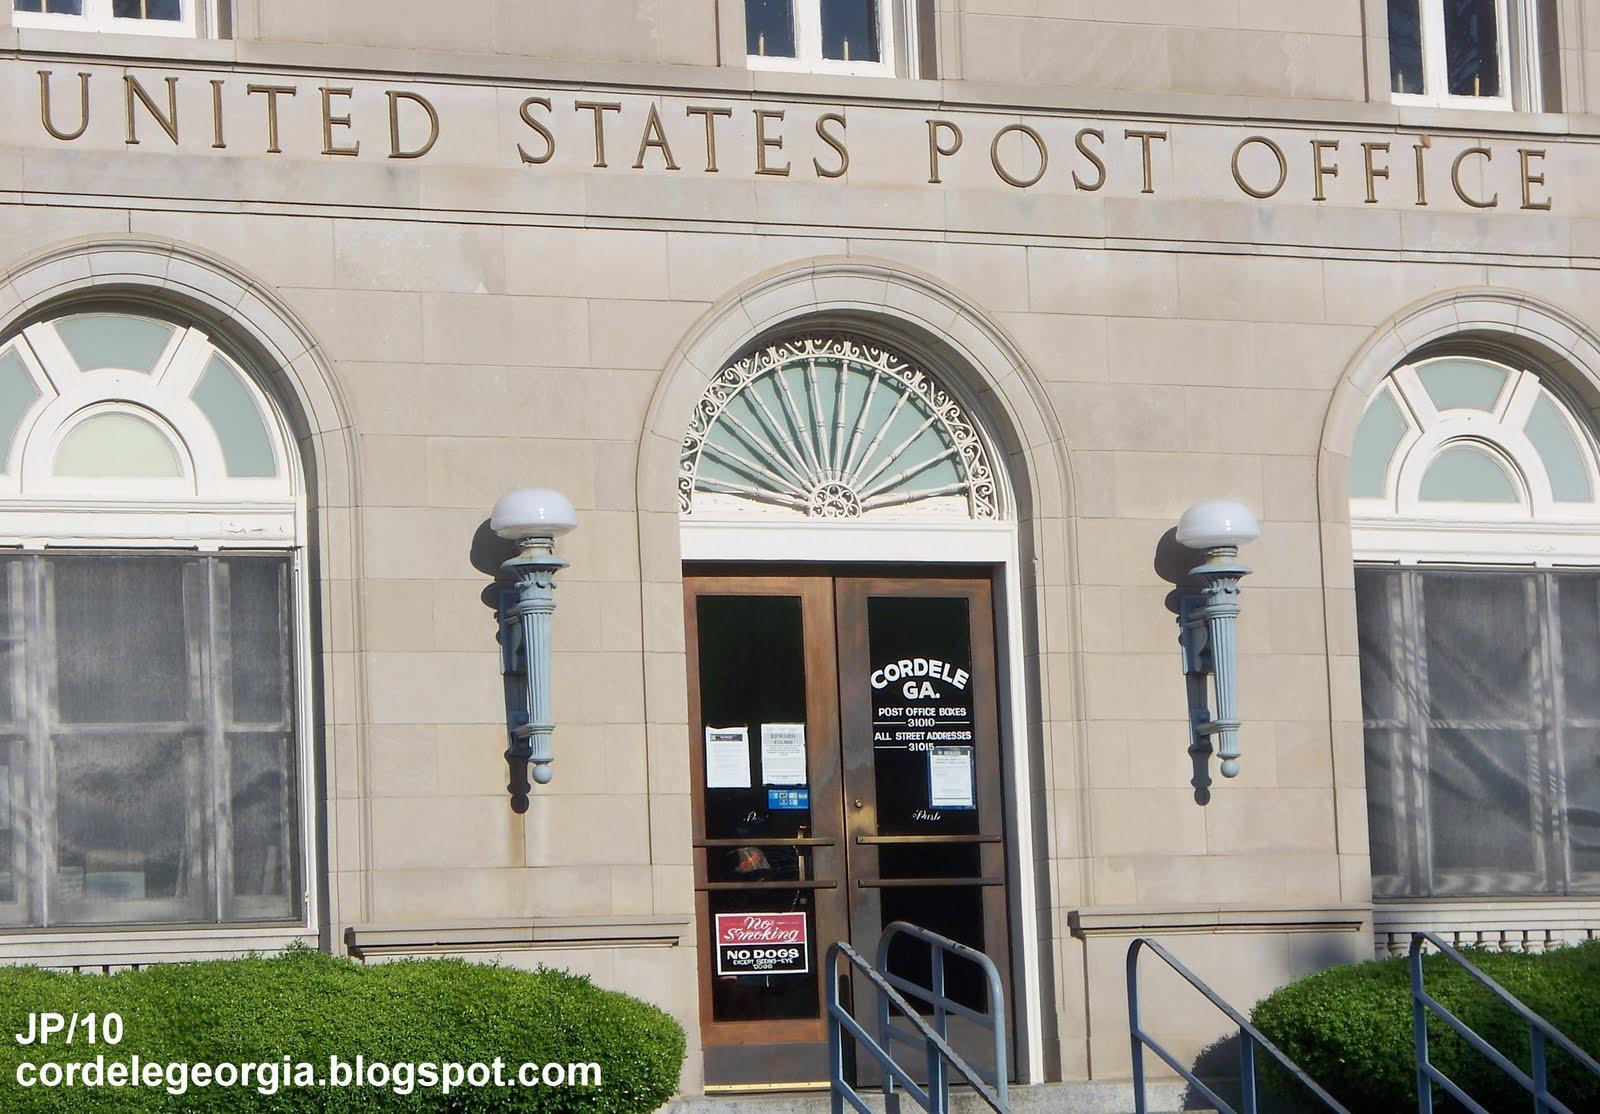 Cordele georgia crisp watermelon restaurant attorney bank hospital hotel fire dept store church - United states post office ...